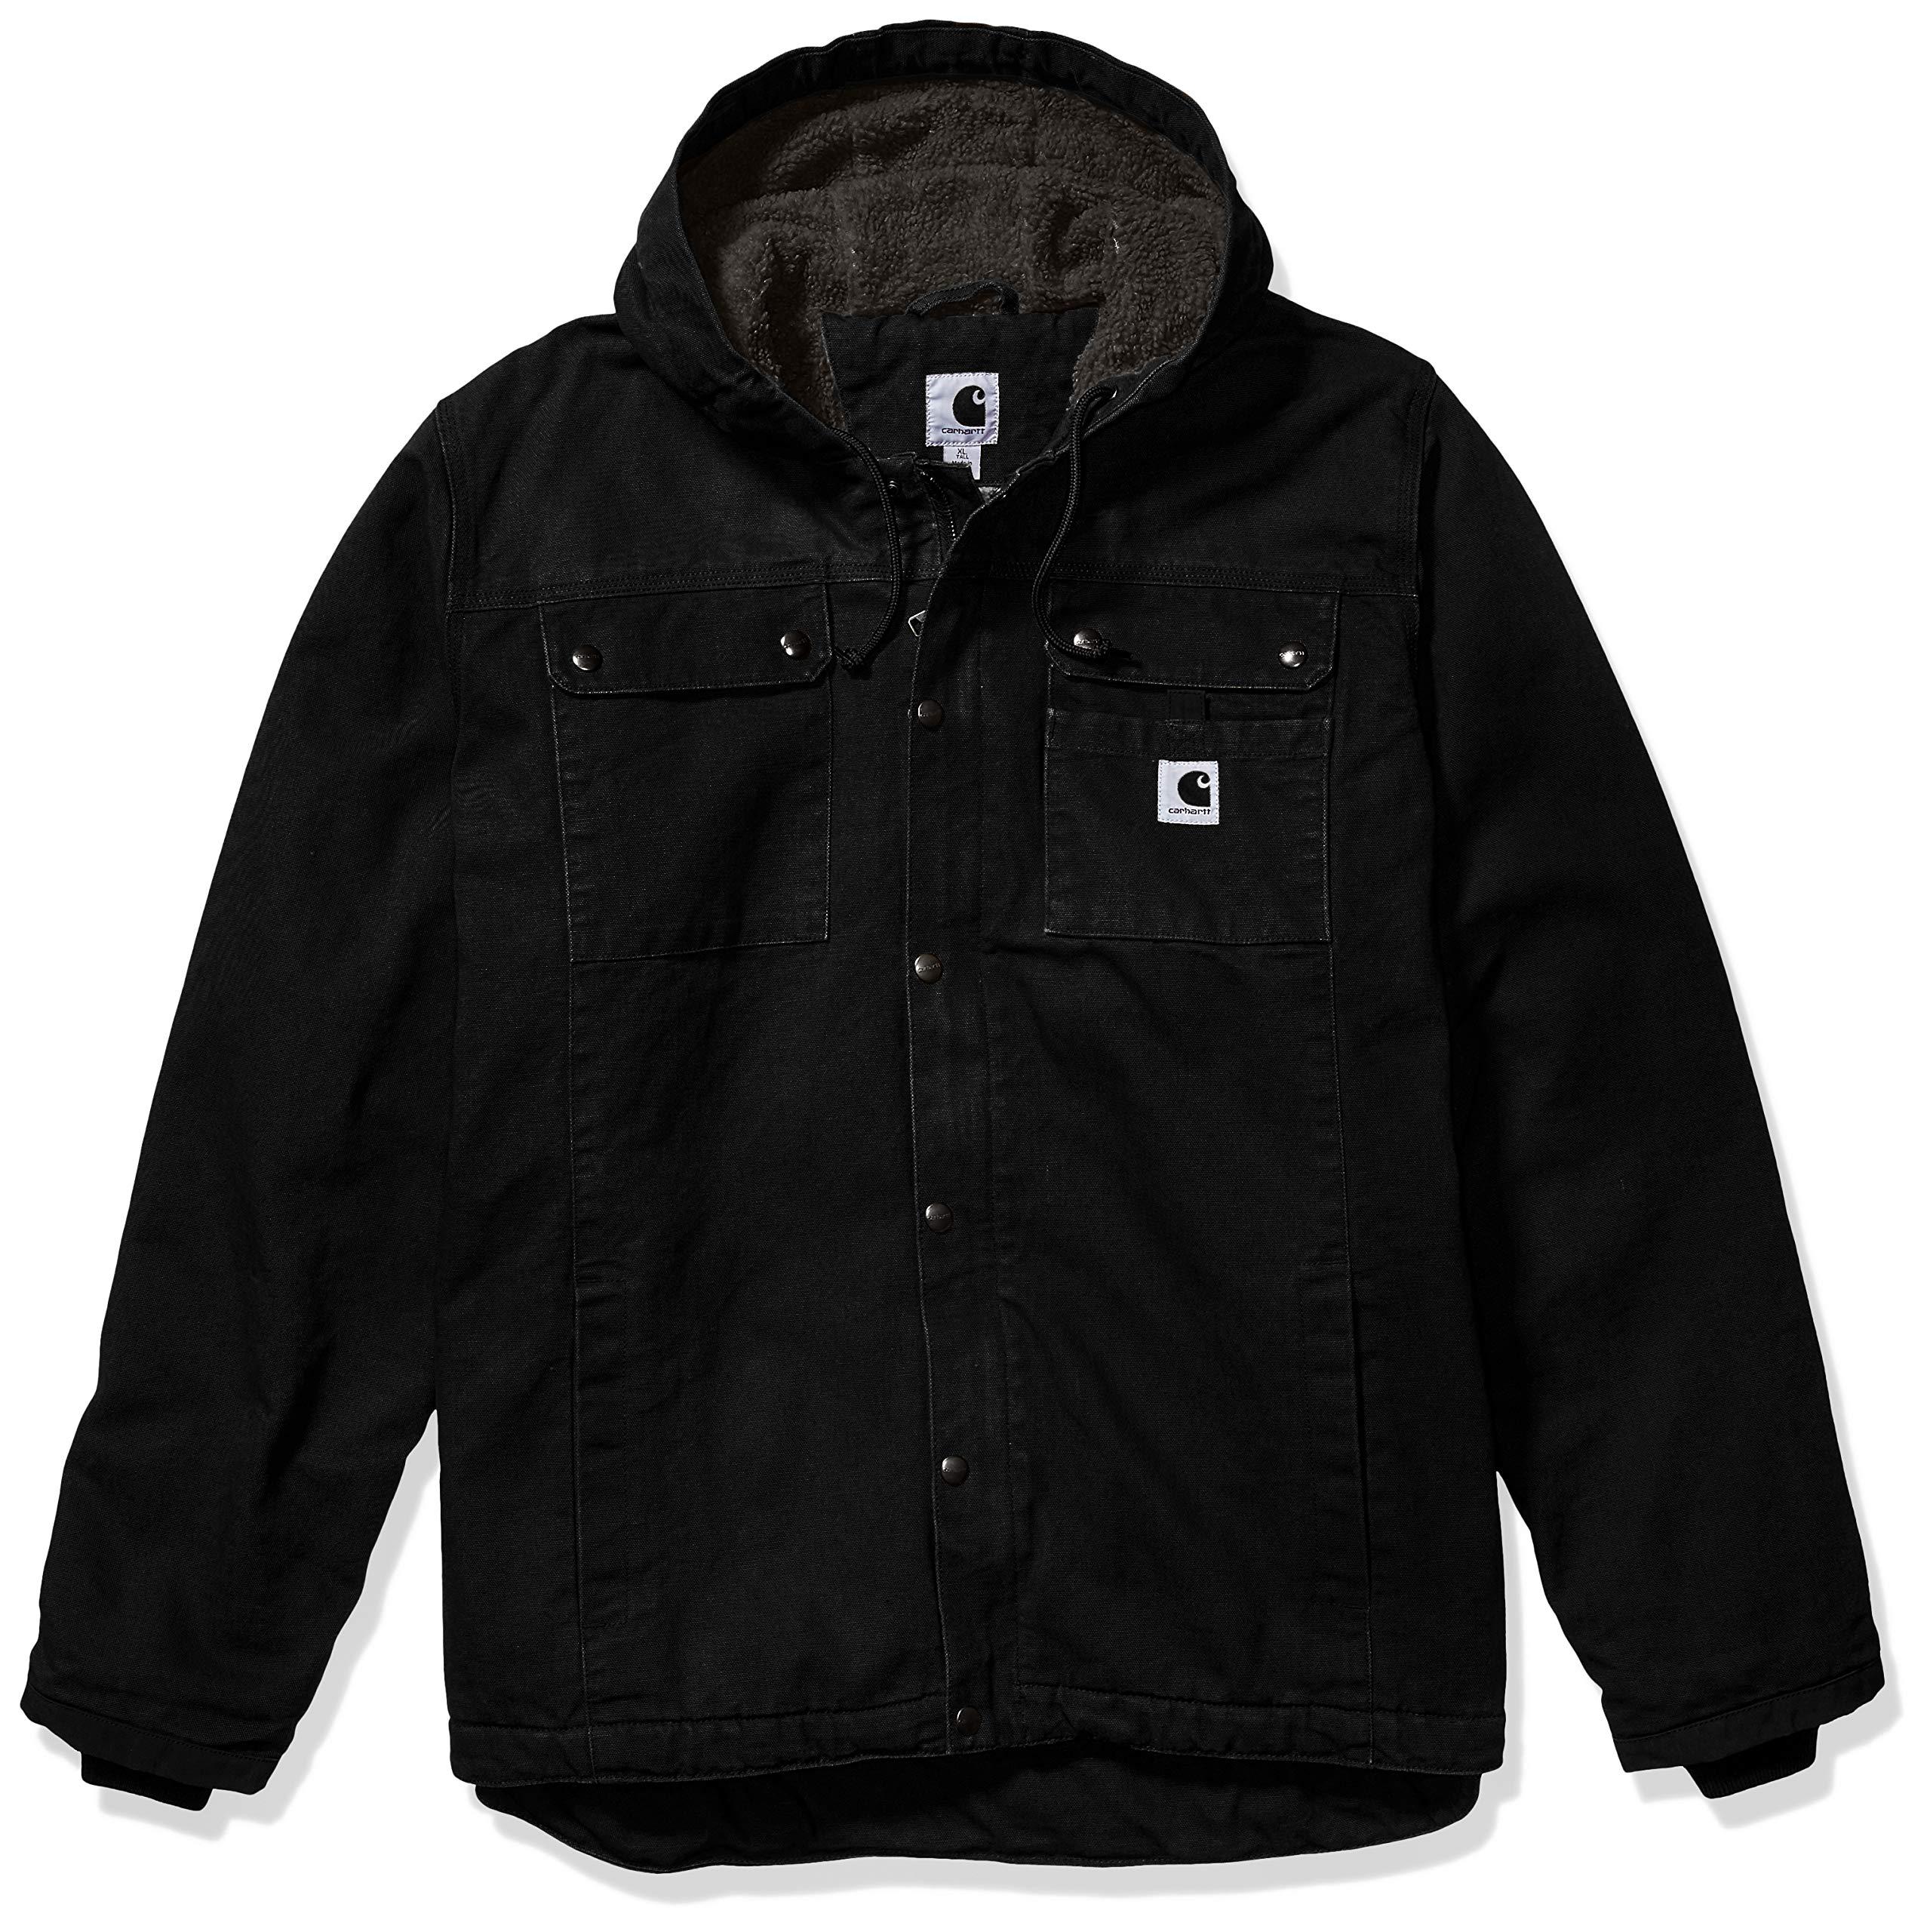 Carhartt Men's Bartlett Jacket (Regular and Big & Tall Sizes), Black, Large by Carhartt